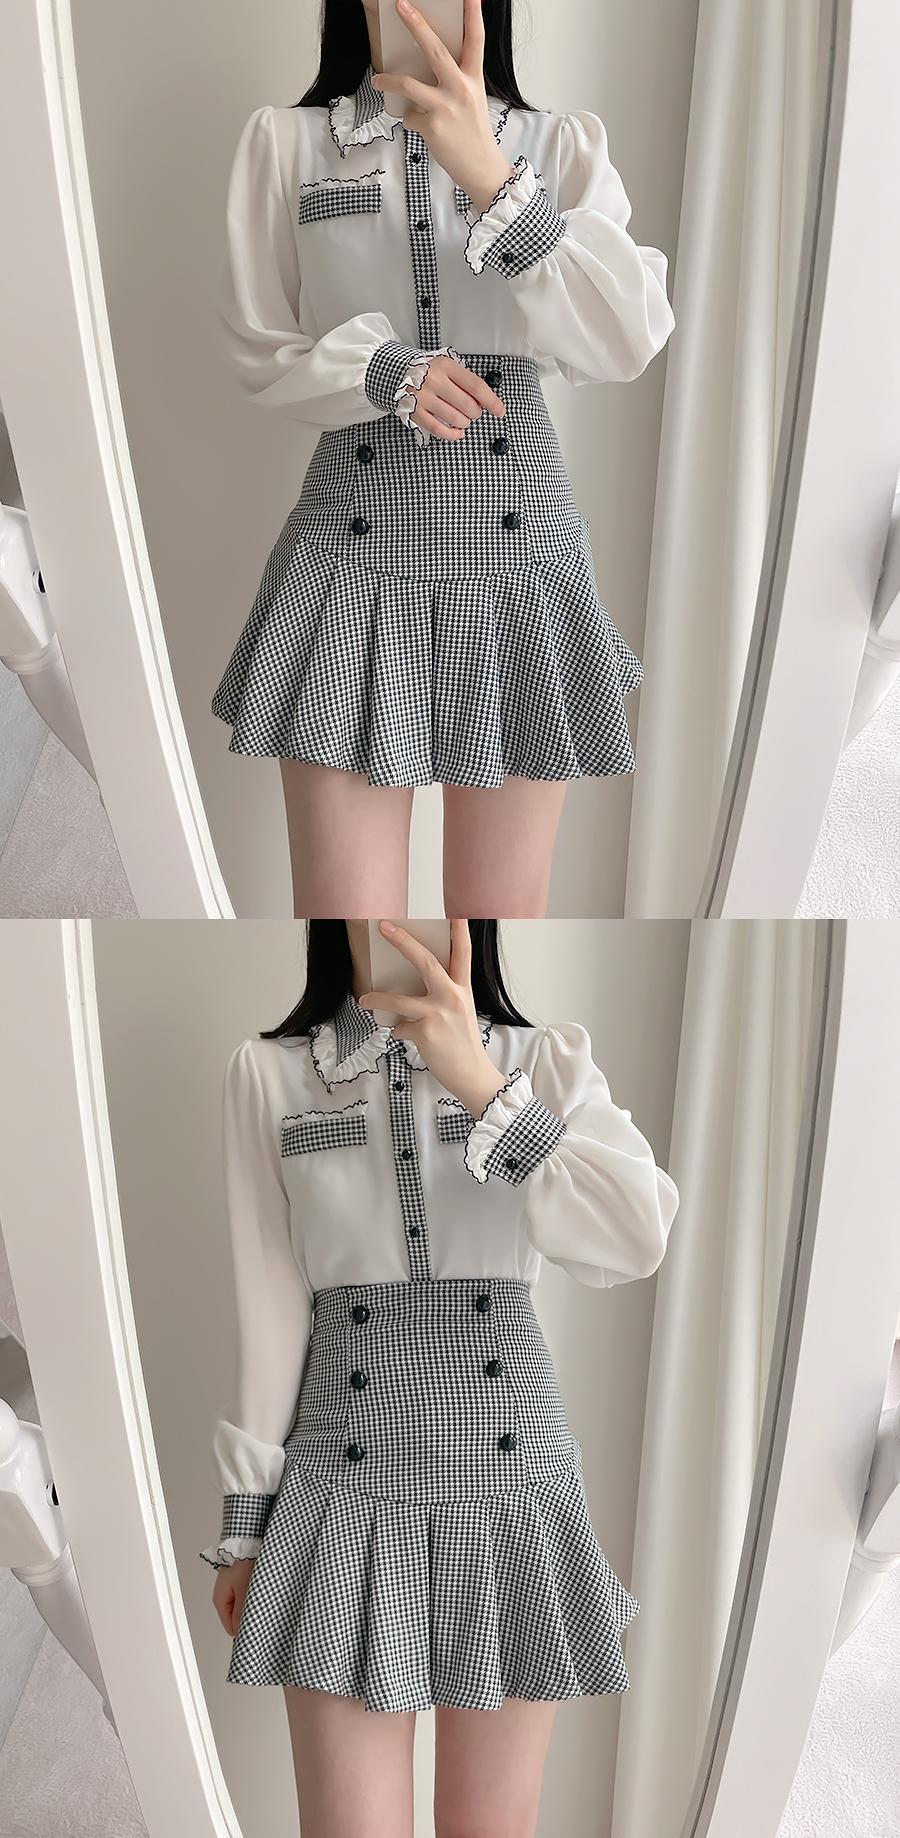 Luciel pleated double skirt pants 2color